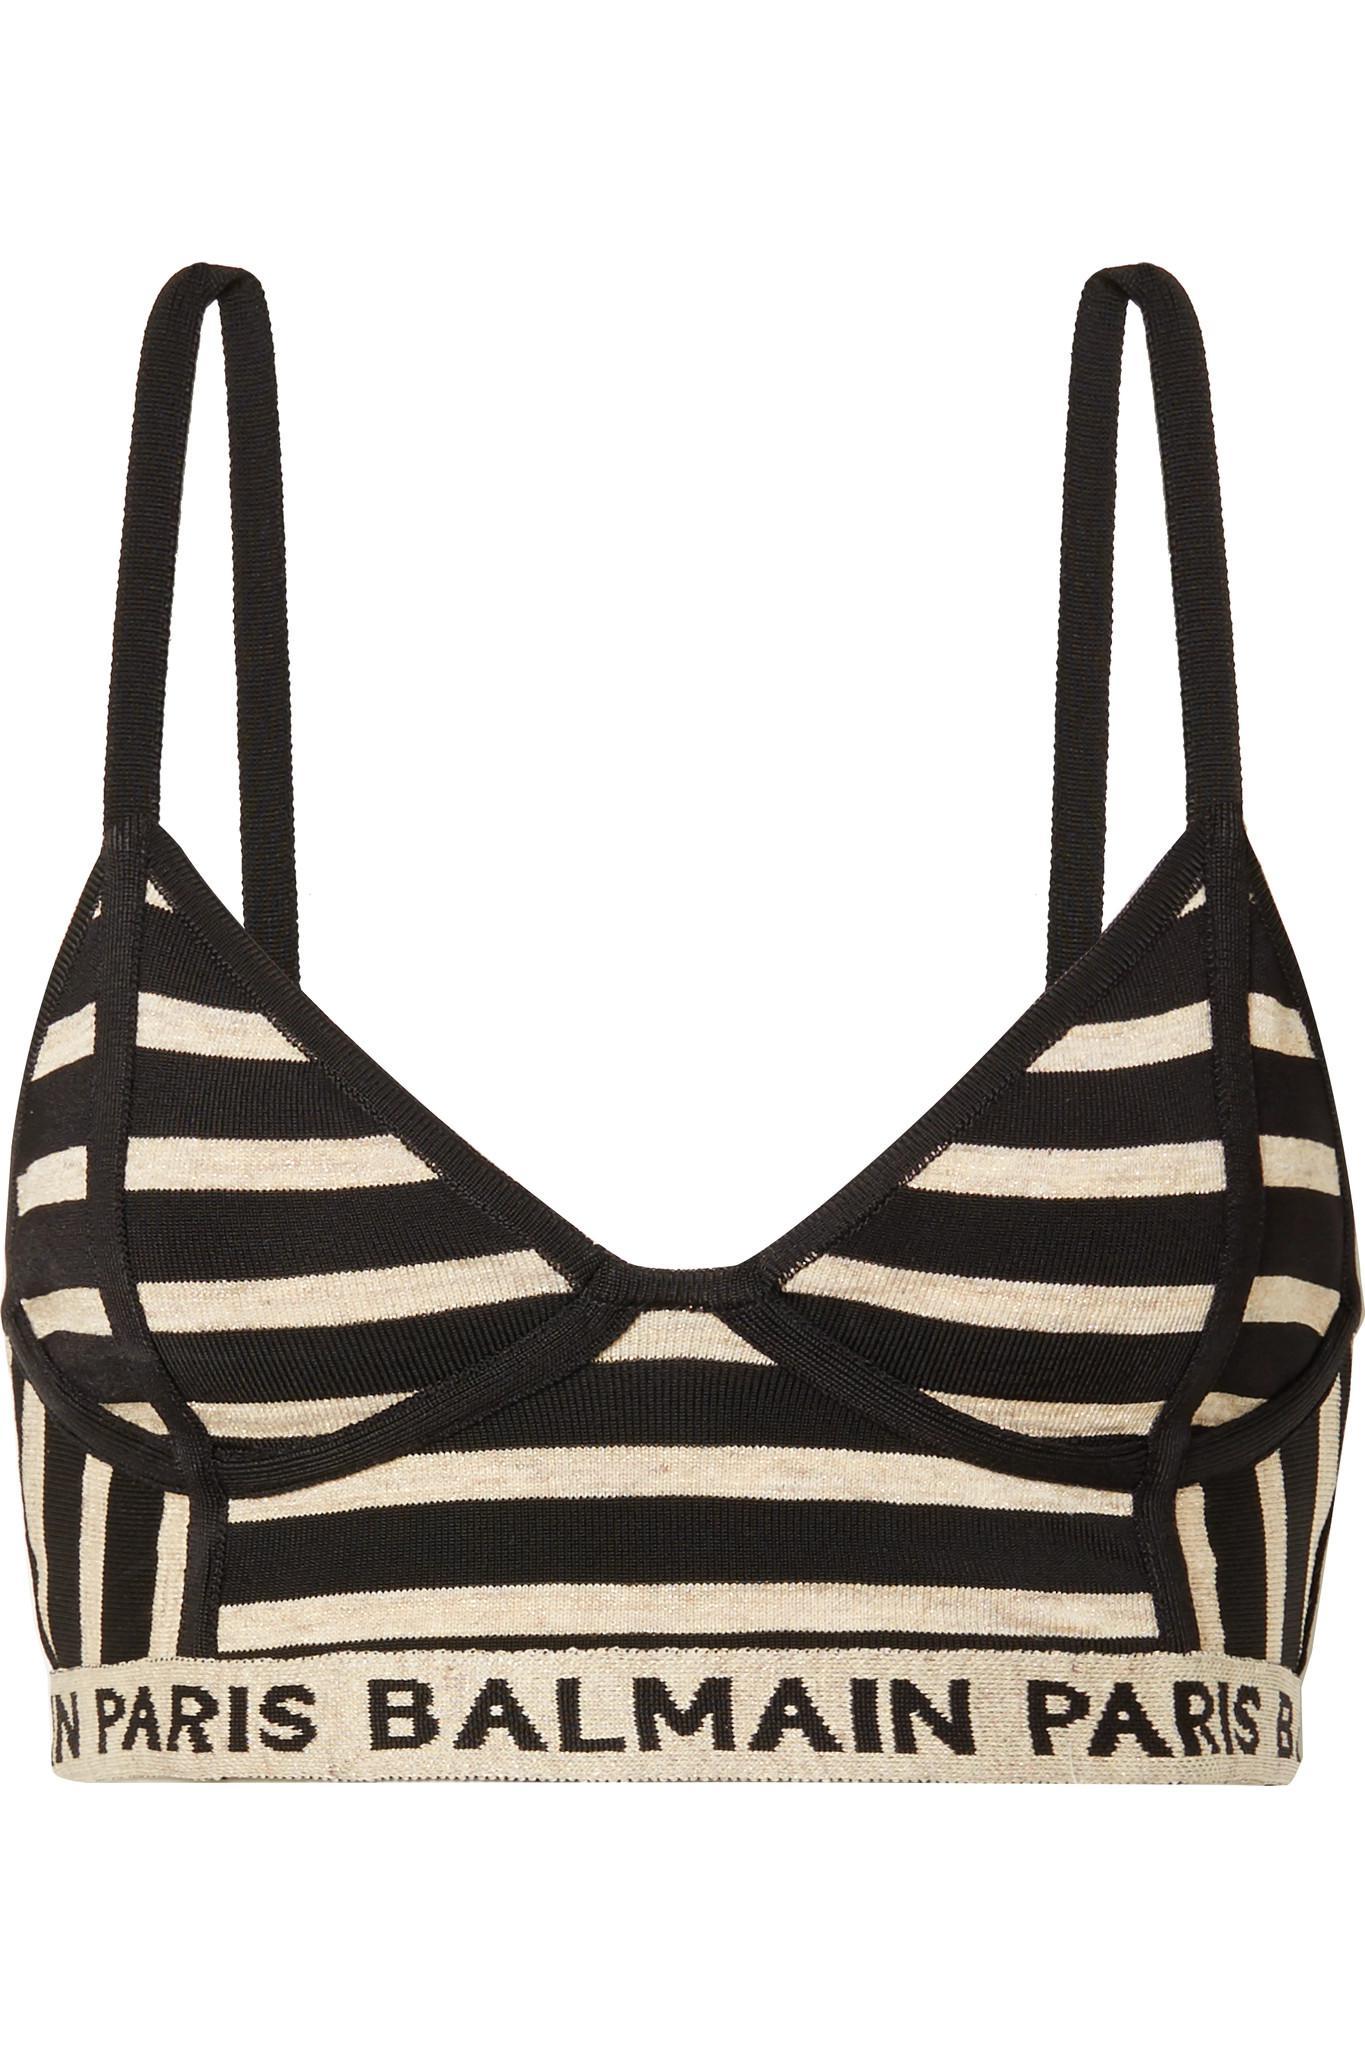 c7114dab11 Balmain. Women s Black Metallic Intarsia-trimmed Striped Stretch-knit  Bralette